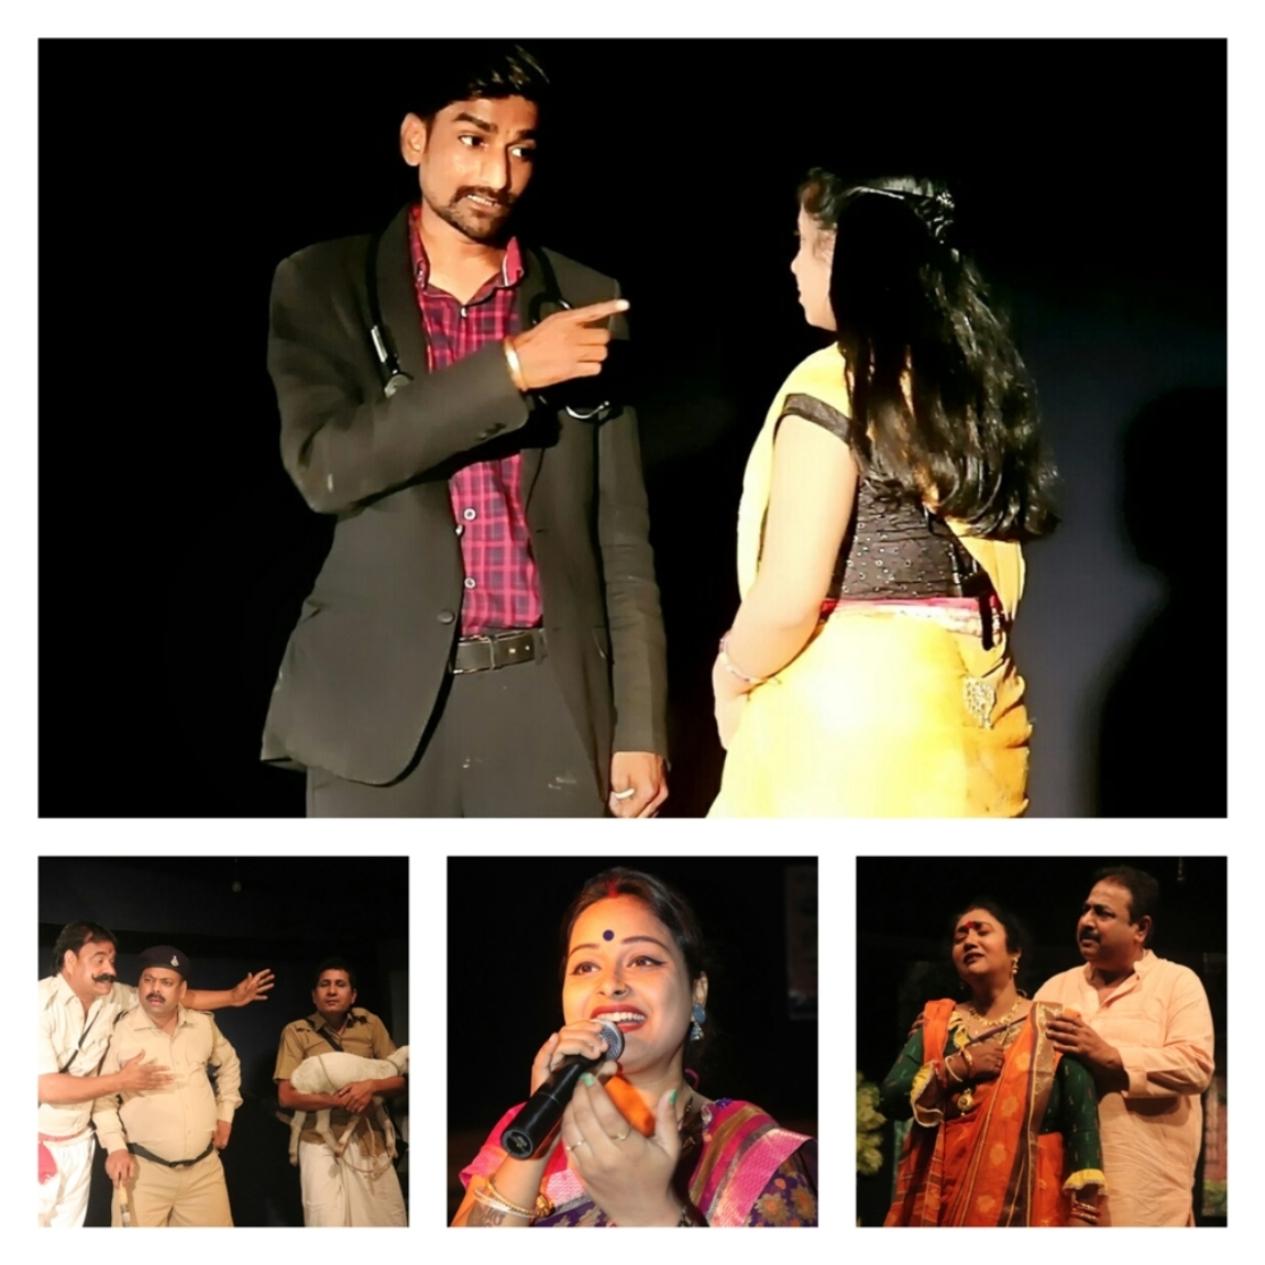 सम्पन्न हुआ मंथन कला परिषद, खगौल द्वारा तीन दिवसीय नाट्य रंगमहोत्सव – 2021